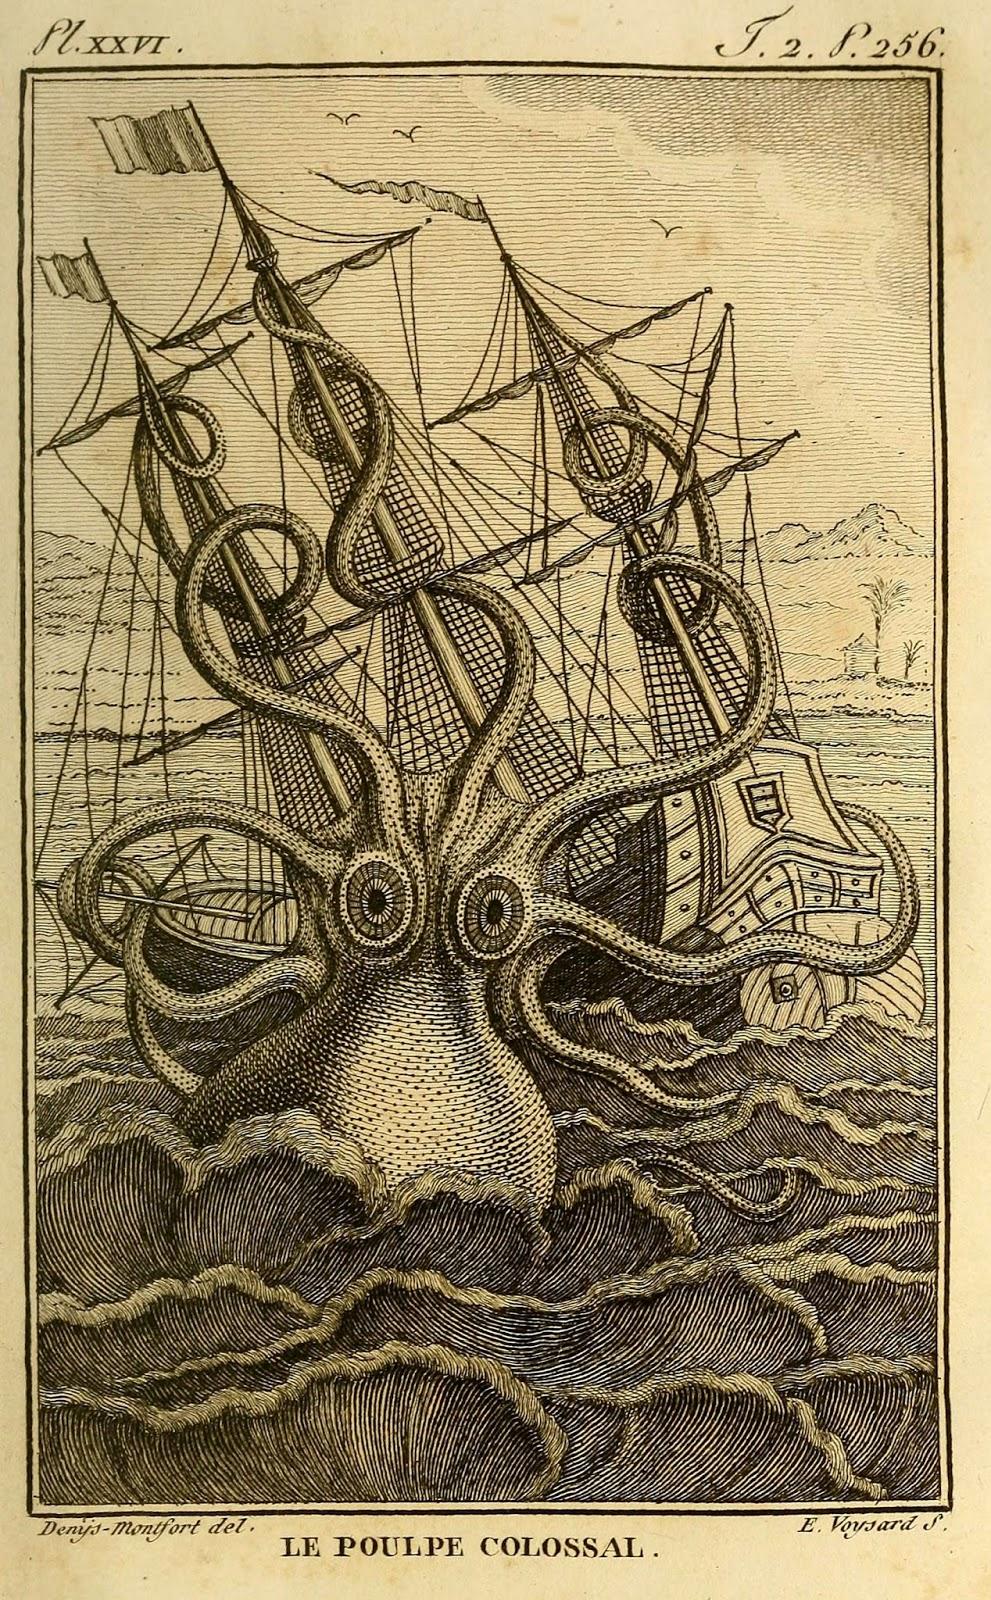 Biodiversity Heritage Library: Release the Kraken!